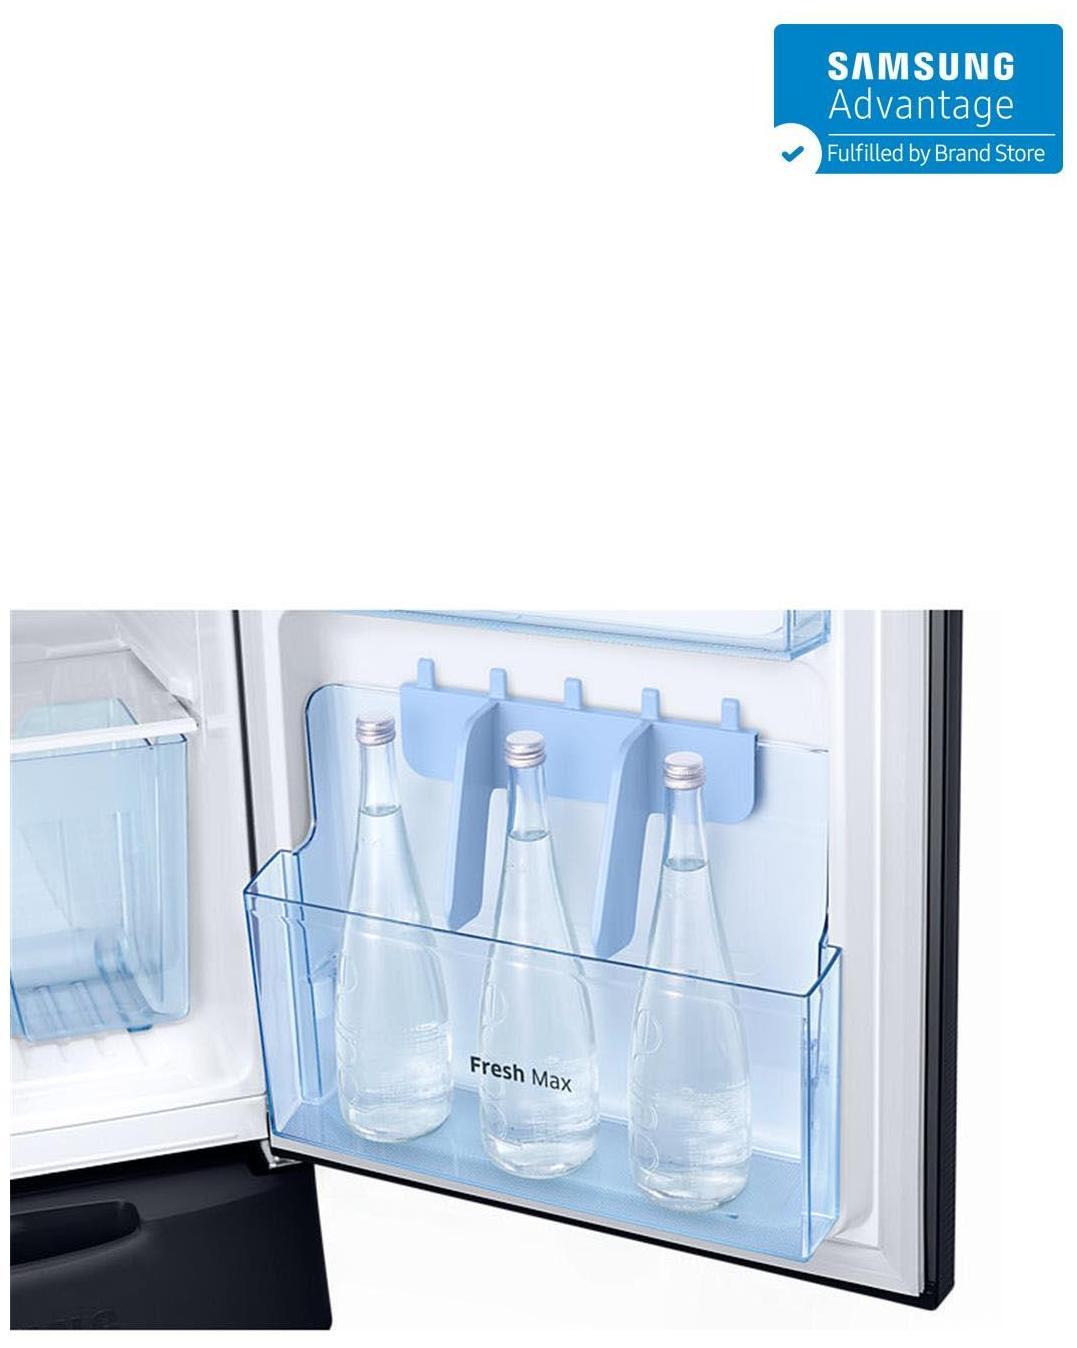 Samsung 212 L Direct Cool Single Door 5 Star Refrigerator (RR22K287ZB2, Star Flower Black)